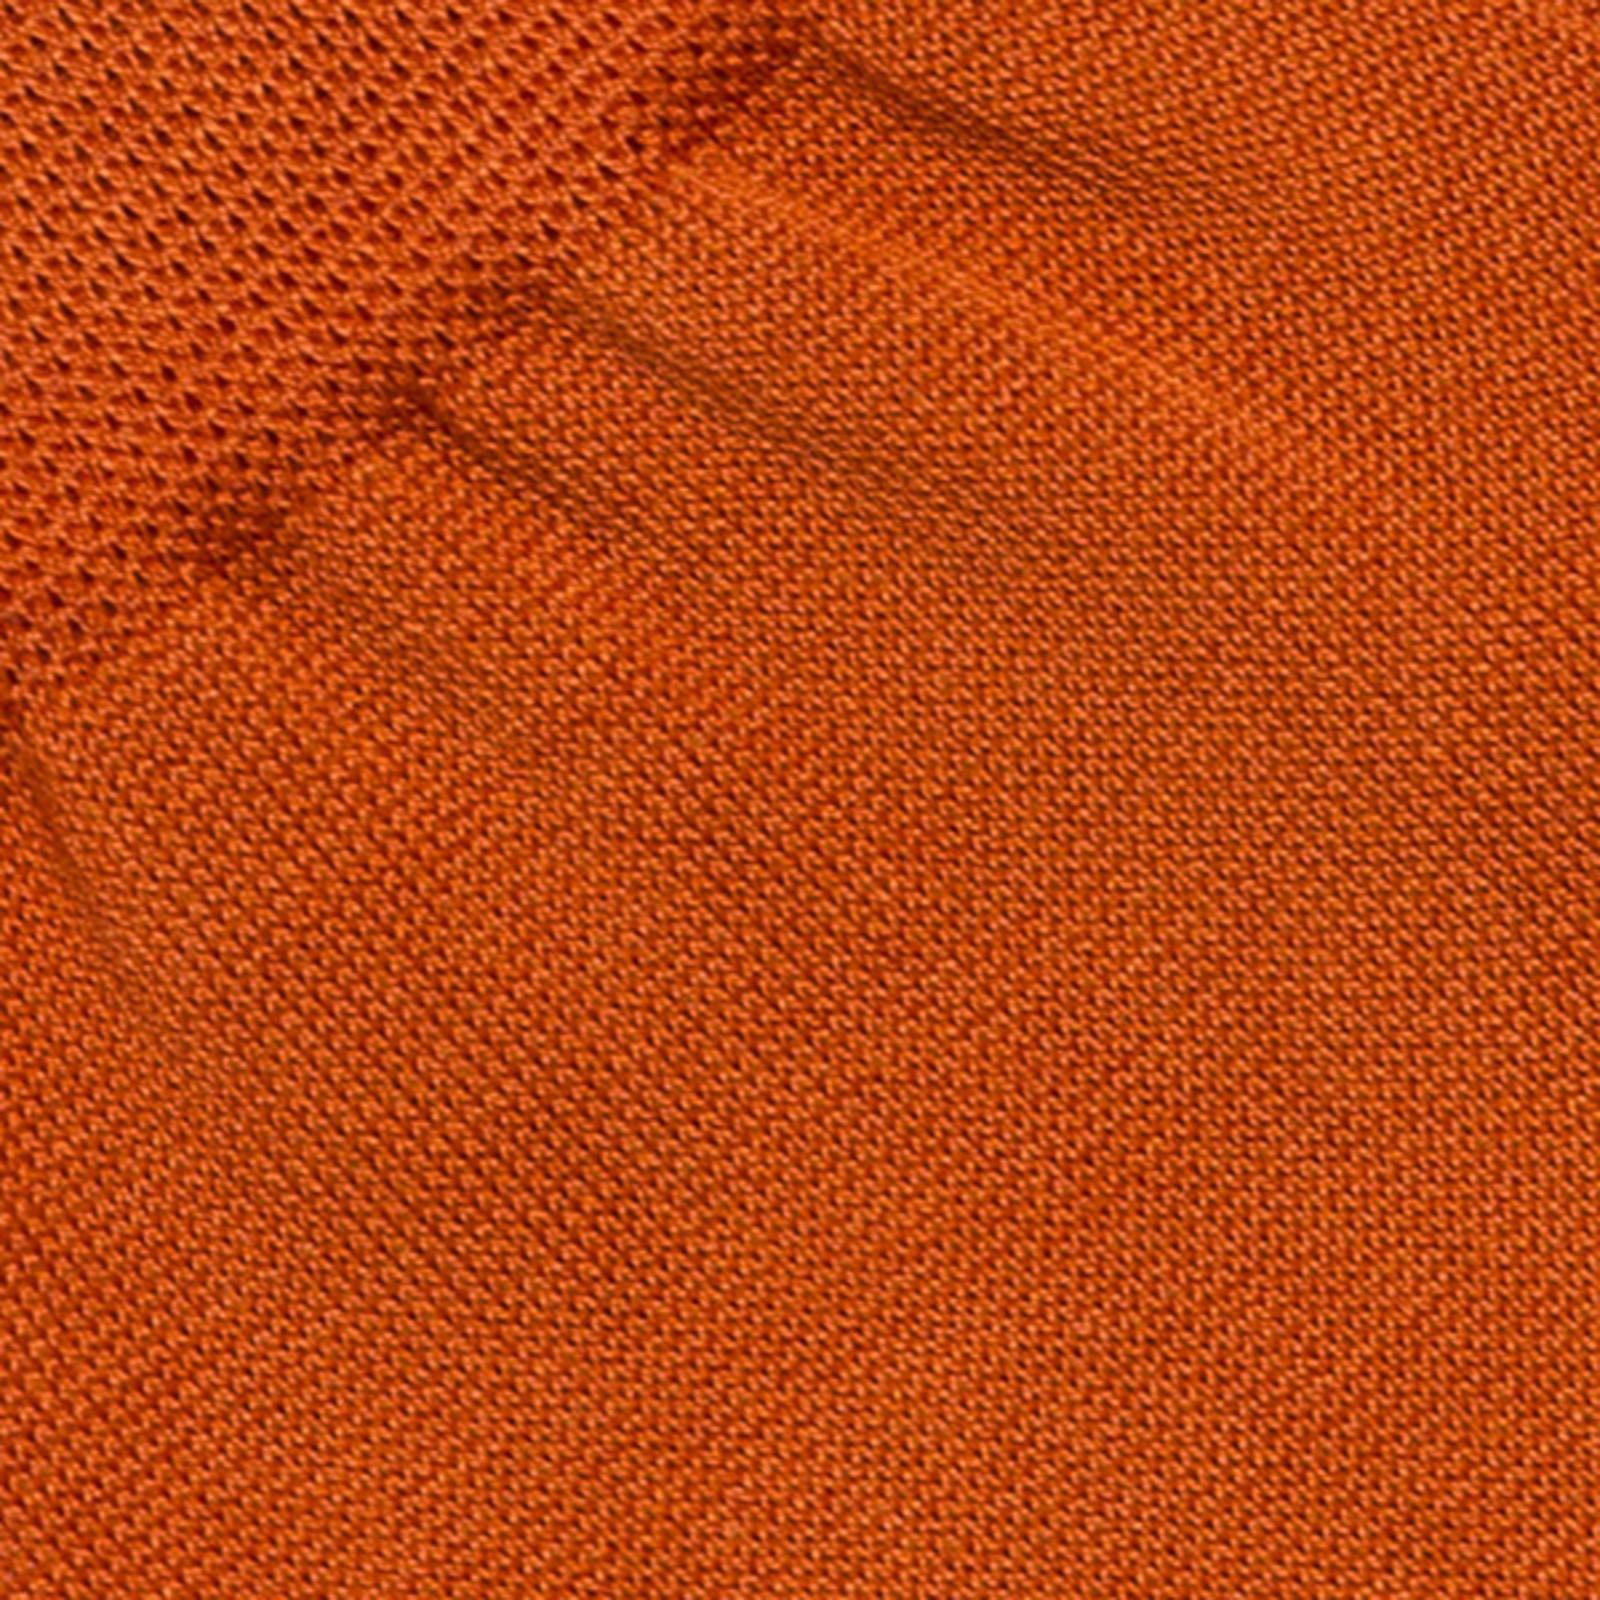 Carlo Lanza Orangenfarbenen Socken Baumwolle